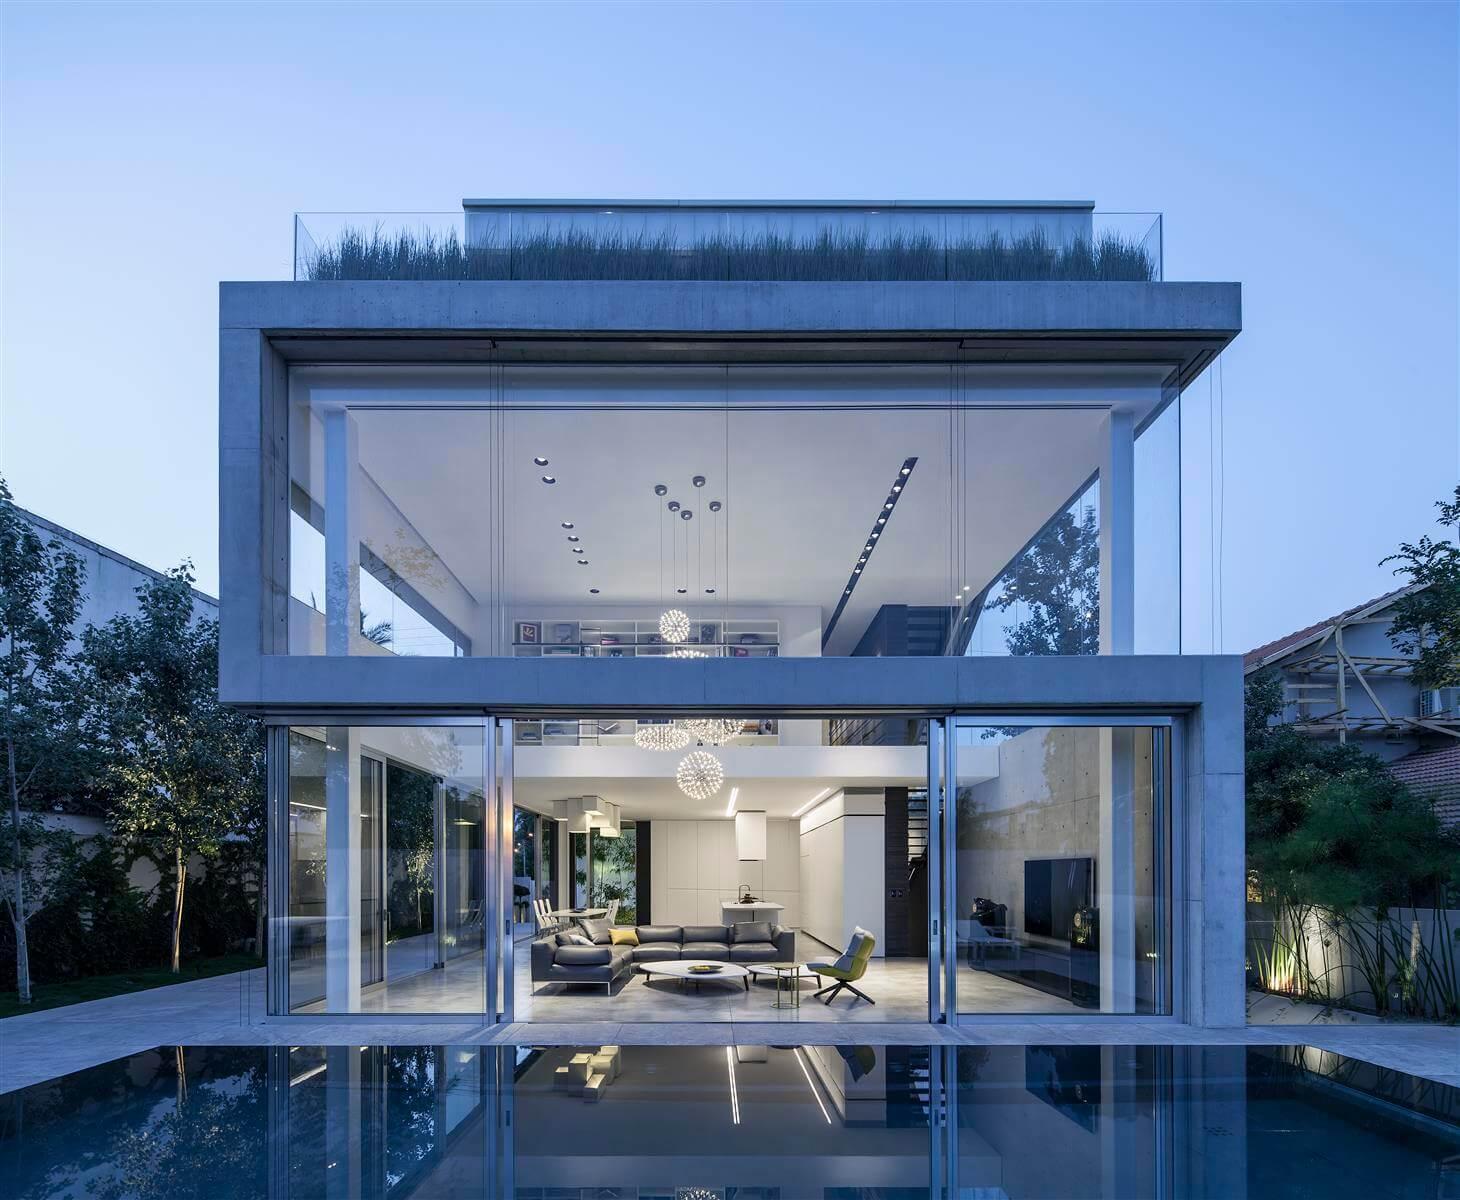 The Concrete Cut House in Ramat Gan by Pitsou Kedem Architects-11